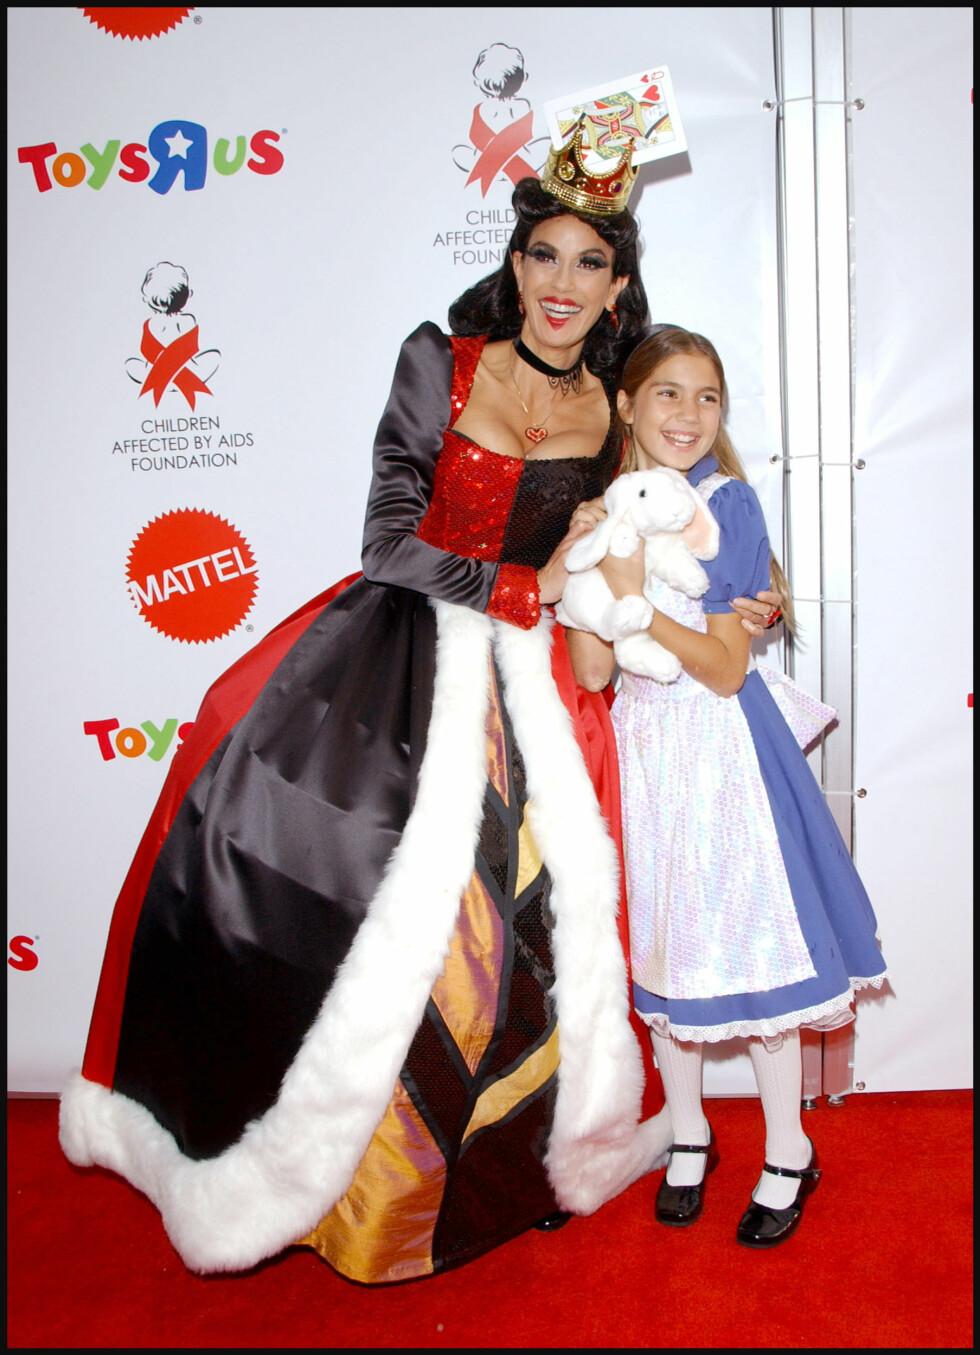 DISNEY-KOSTYME: «Frustrerte fruer»-stjernen Teri Hatcher og hennes datter Emerson Rose  trollbandt alle med sine kostymer i 2007. Foto: Stella Pictures